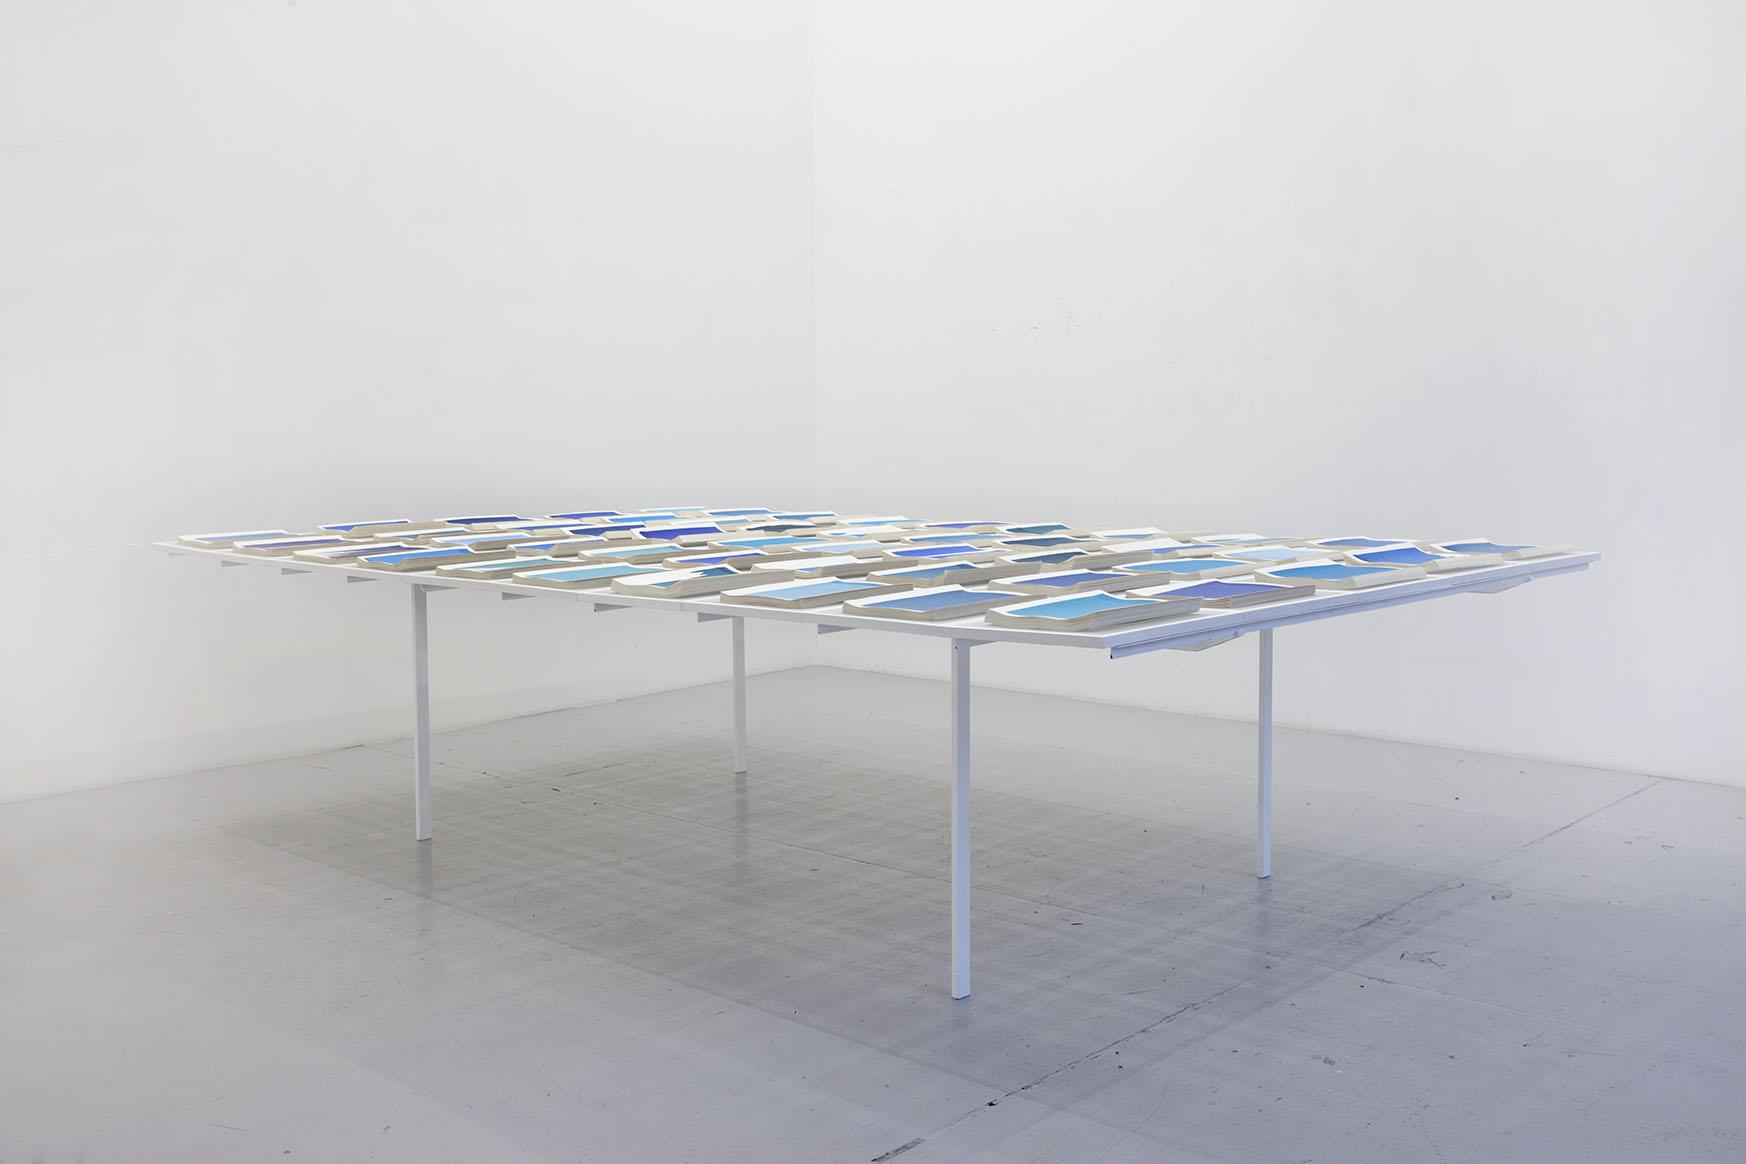 Untitled , 2012, Fifty handmade books